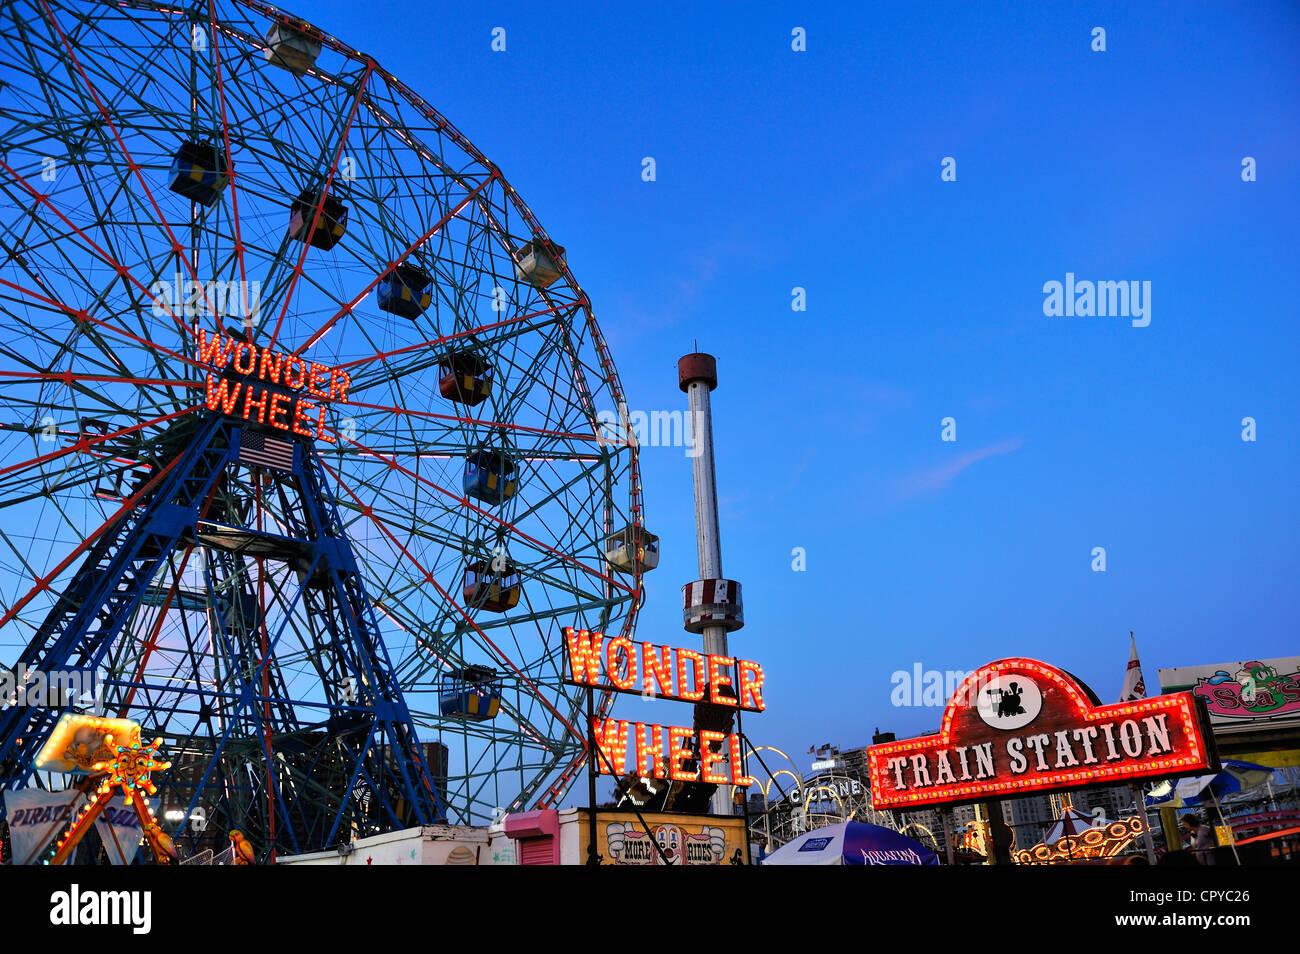 Wonder Wheel at Coney Island Amusement Park - Stock Image